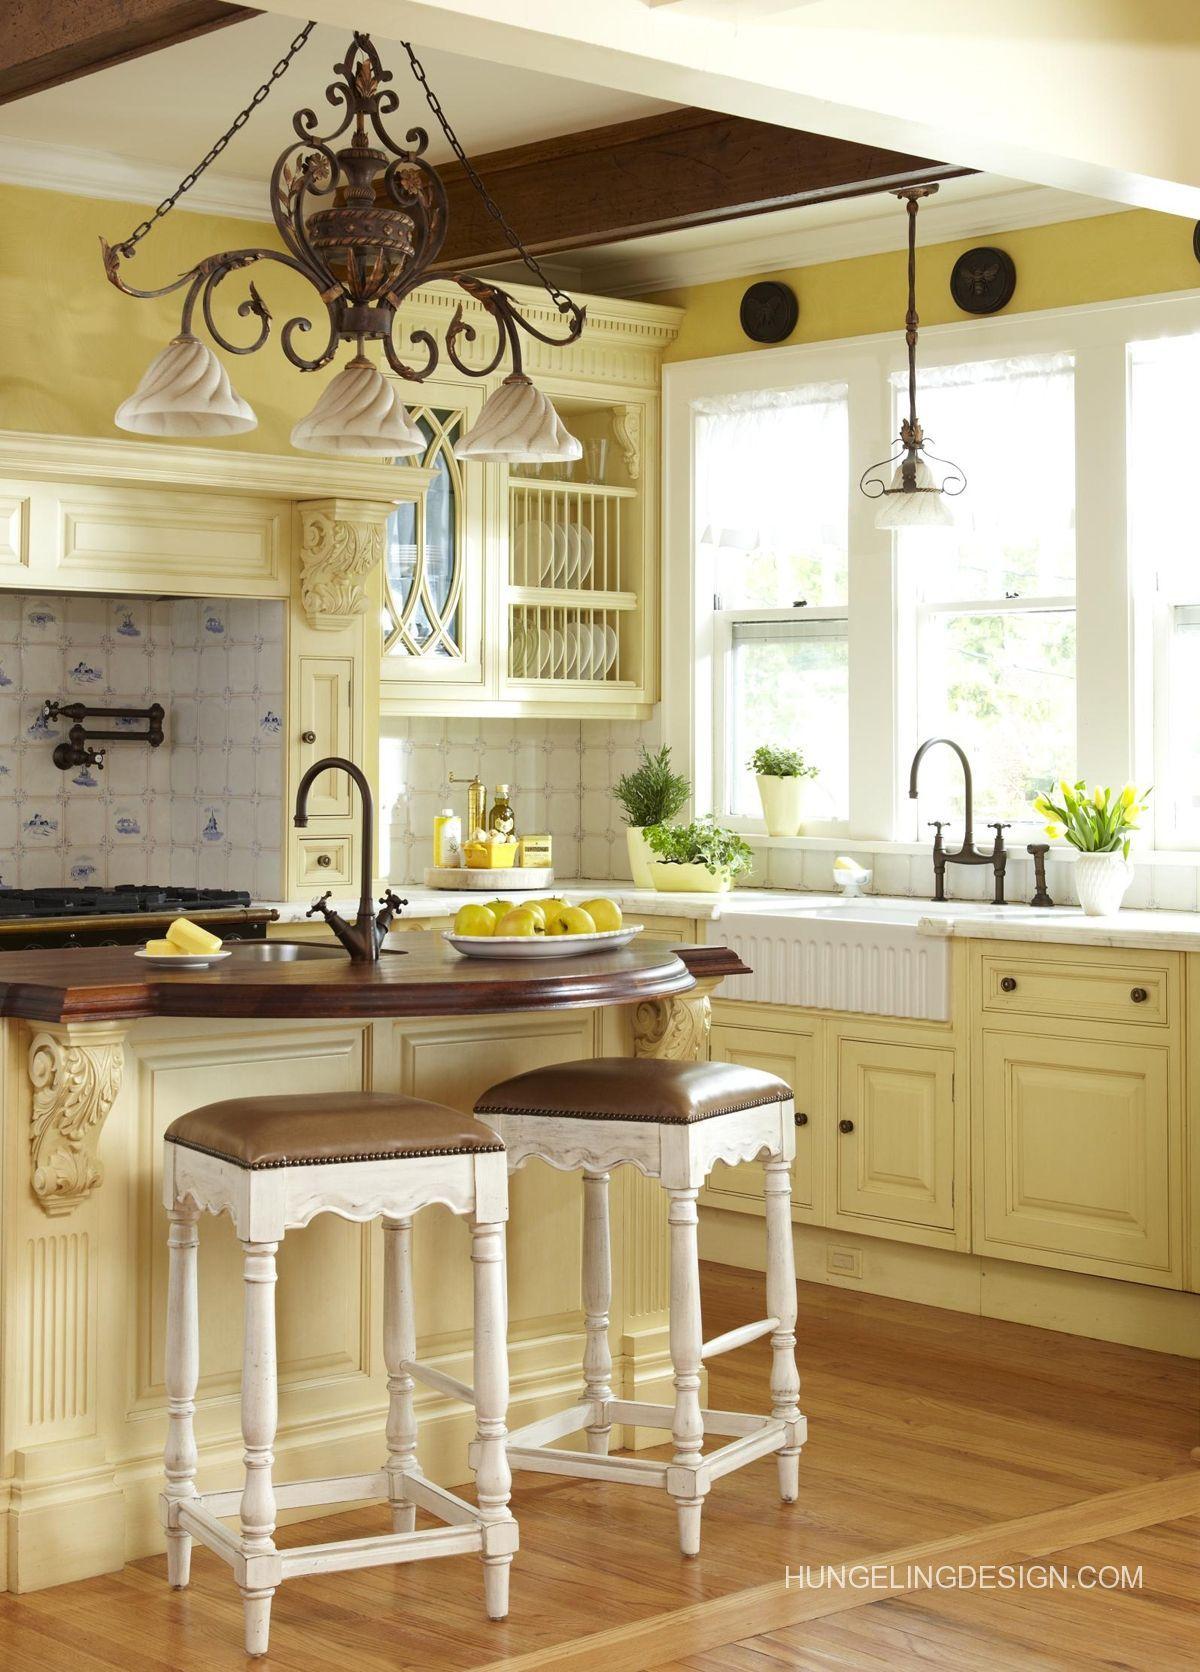 Butter Yellow Kitchen Home Interior In 2020 Kitchen Design Decor Country Kitchen Designs French Country Kitchen